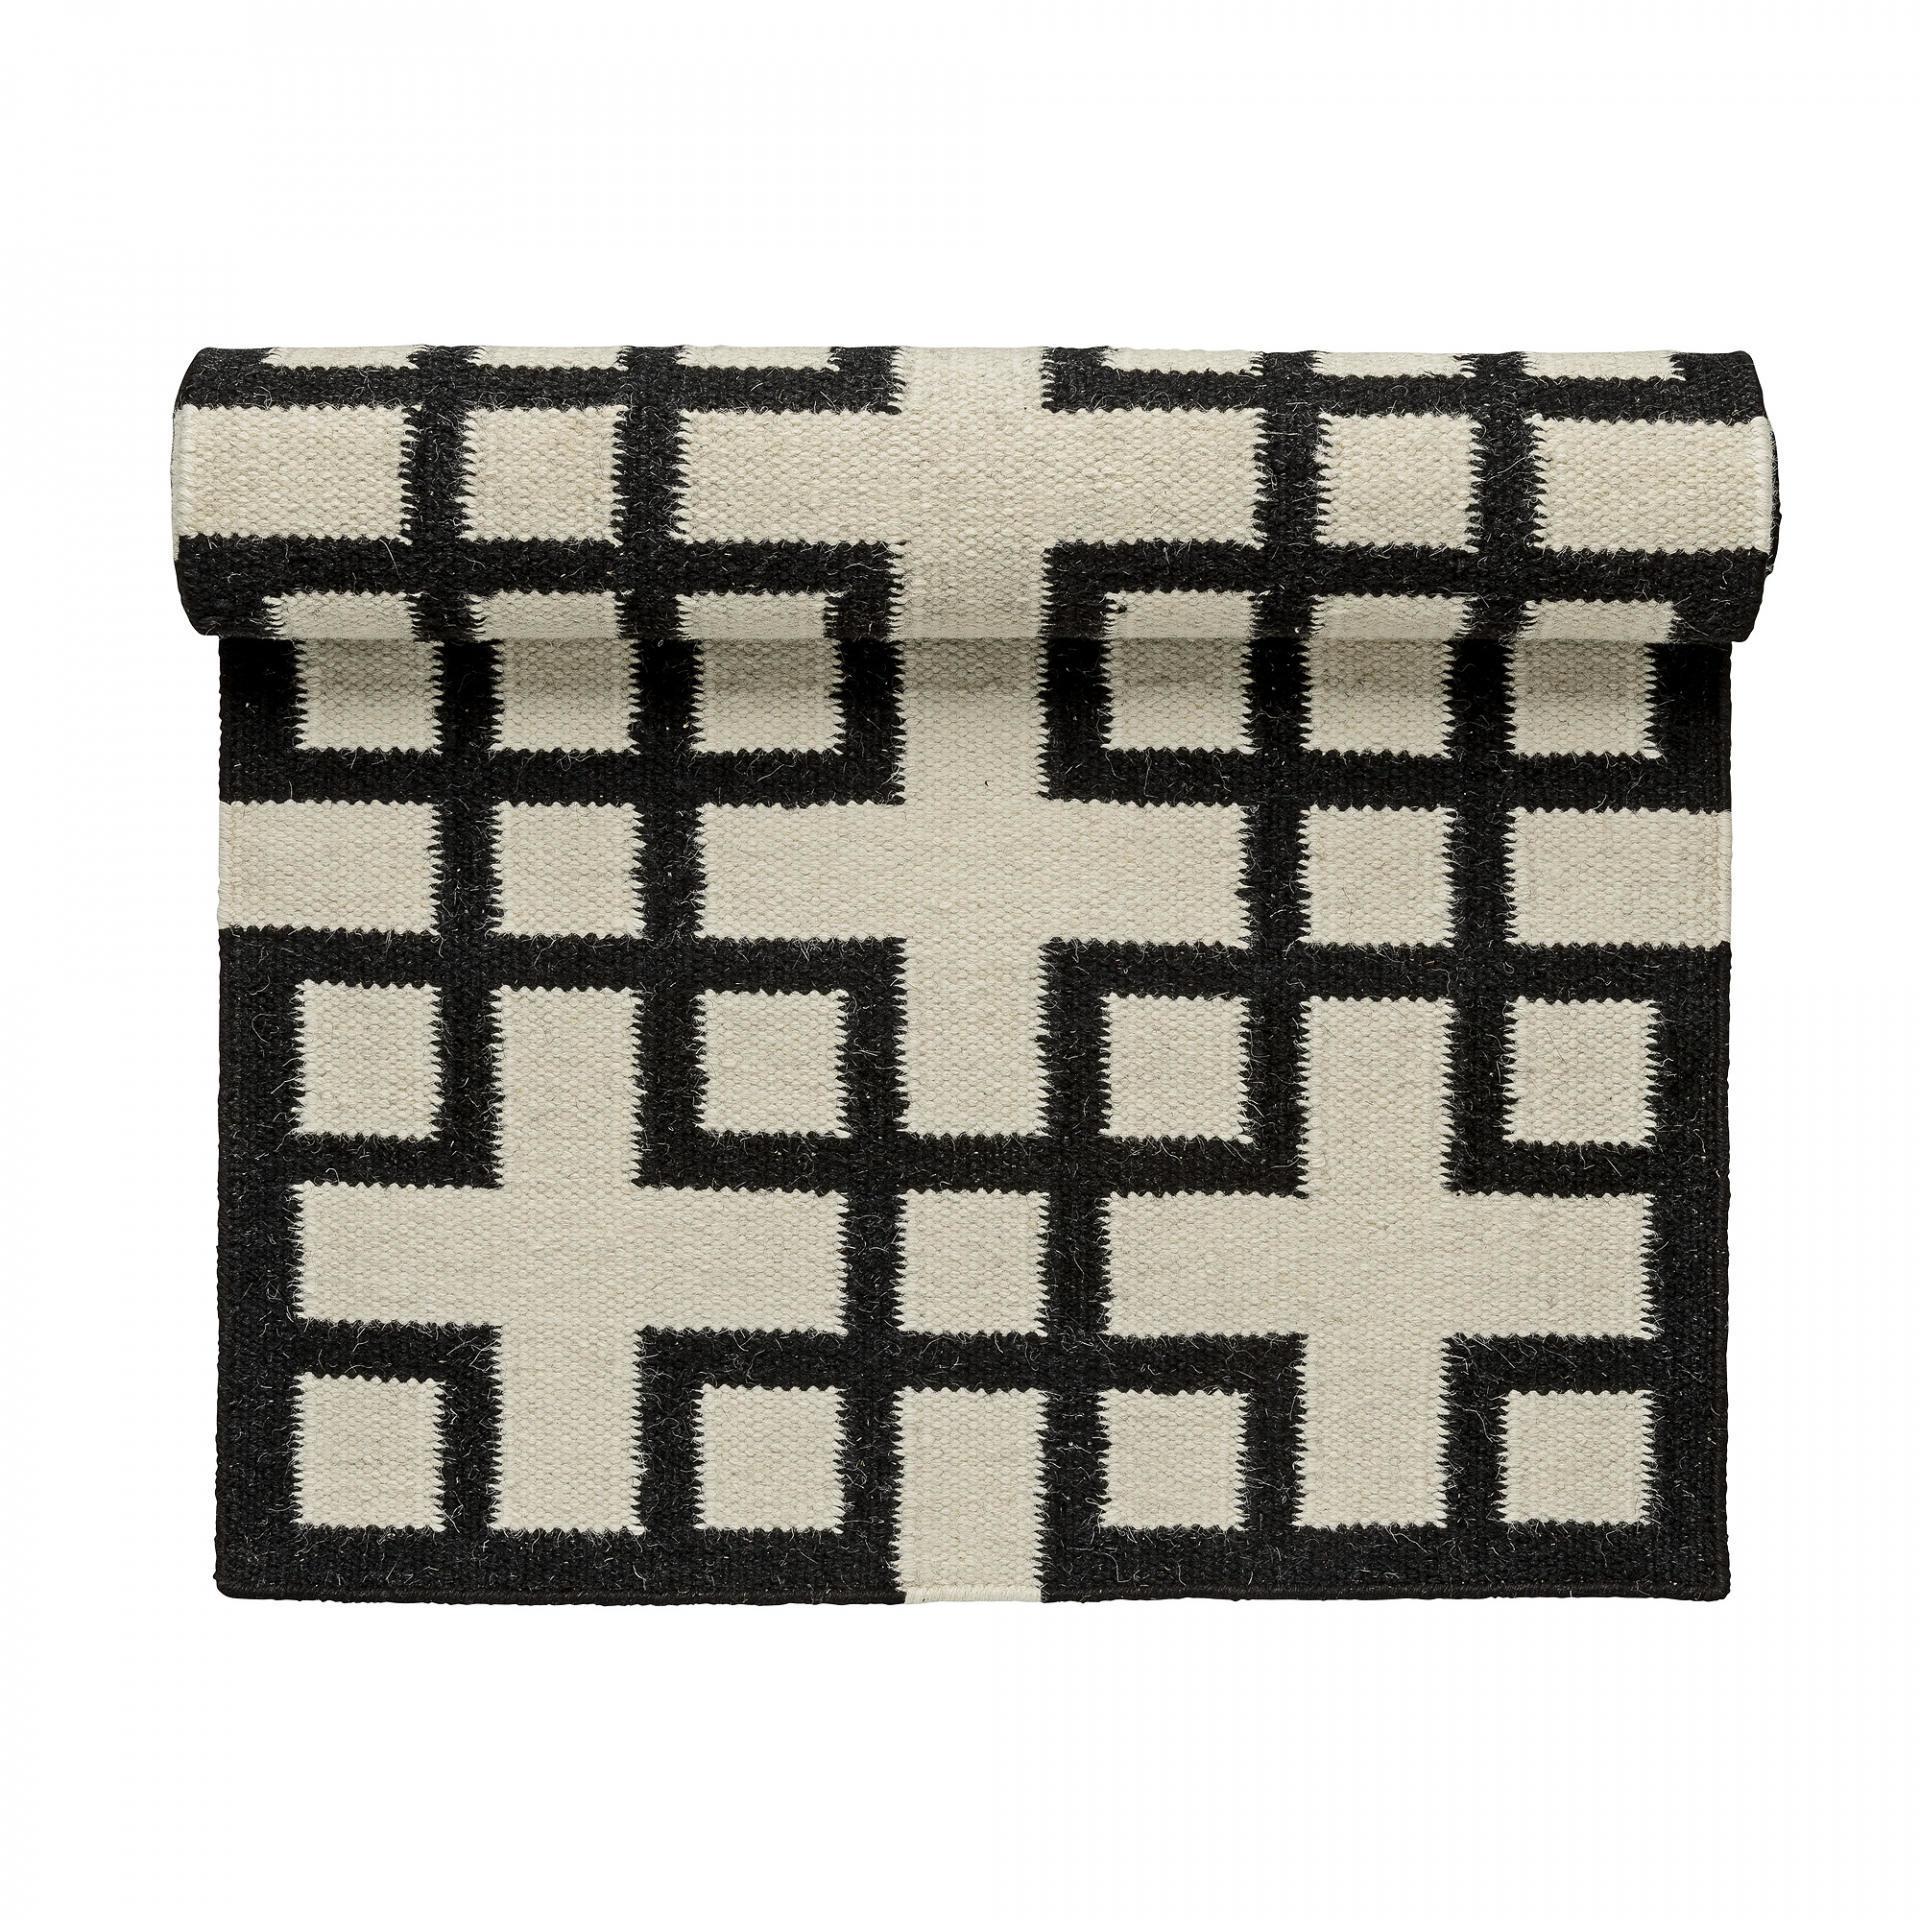 Vlněný koberec Mono 140x200 cm, černá barva, bílá barva, textil Bílá